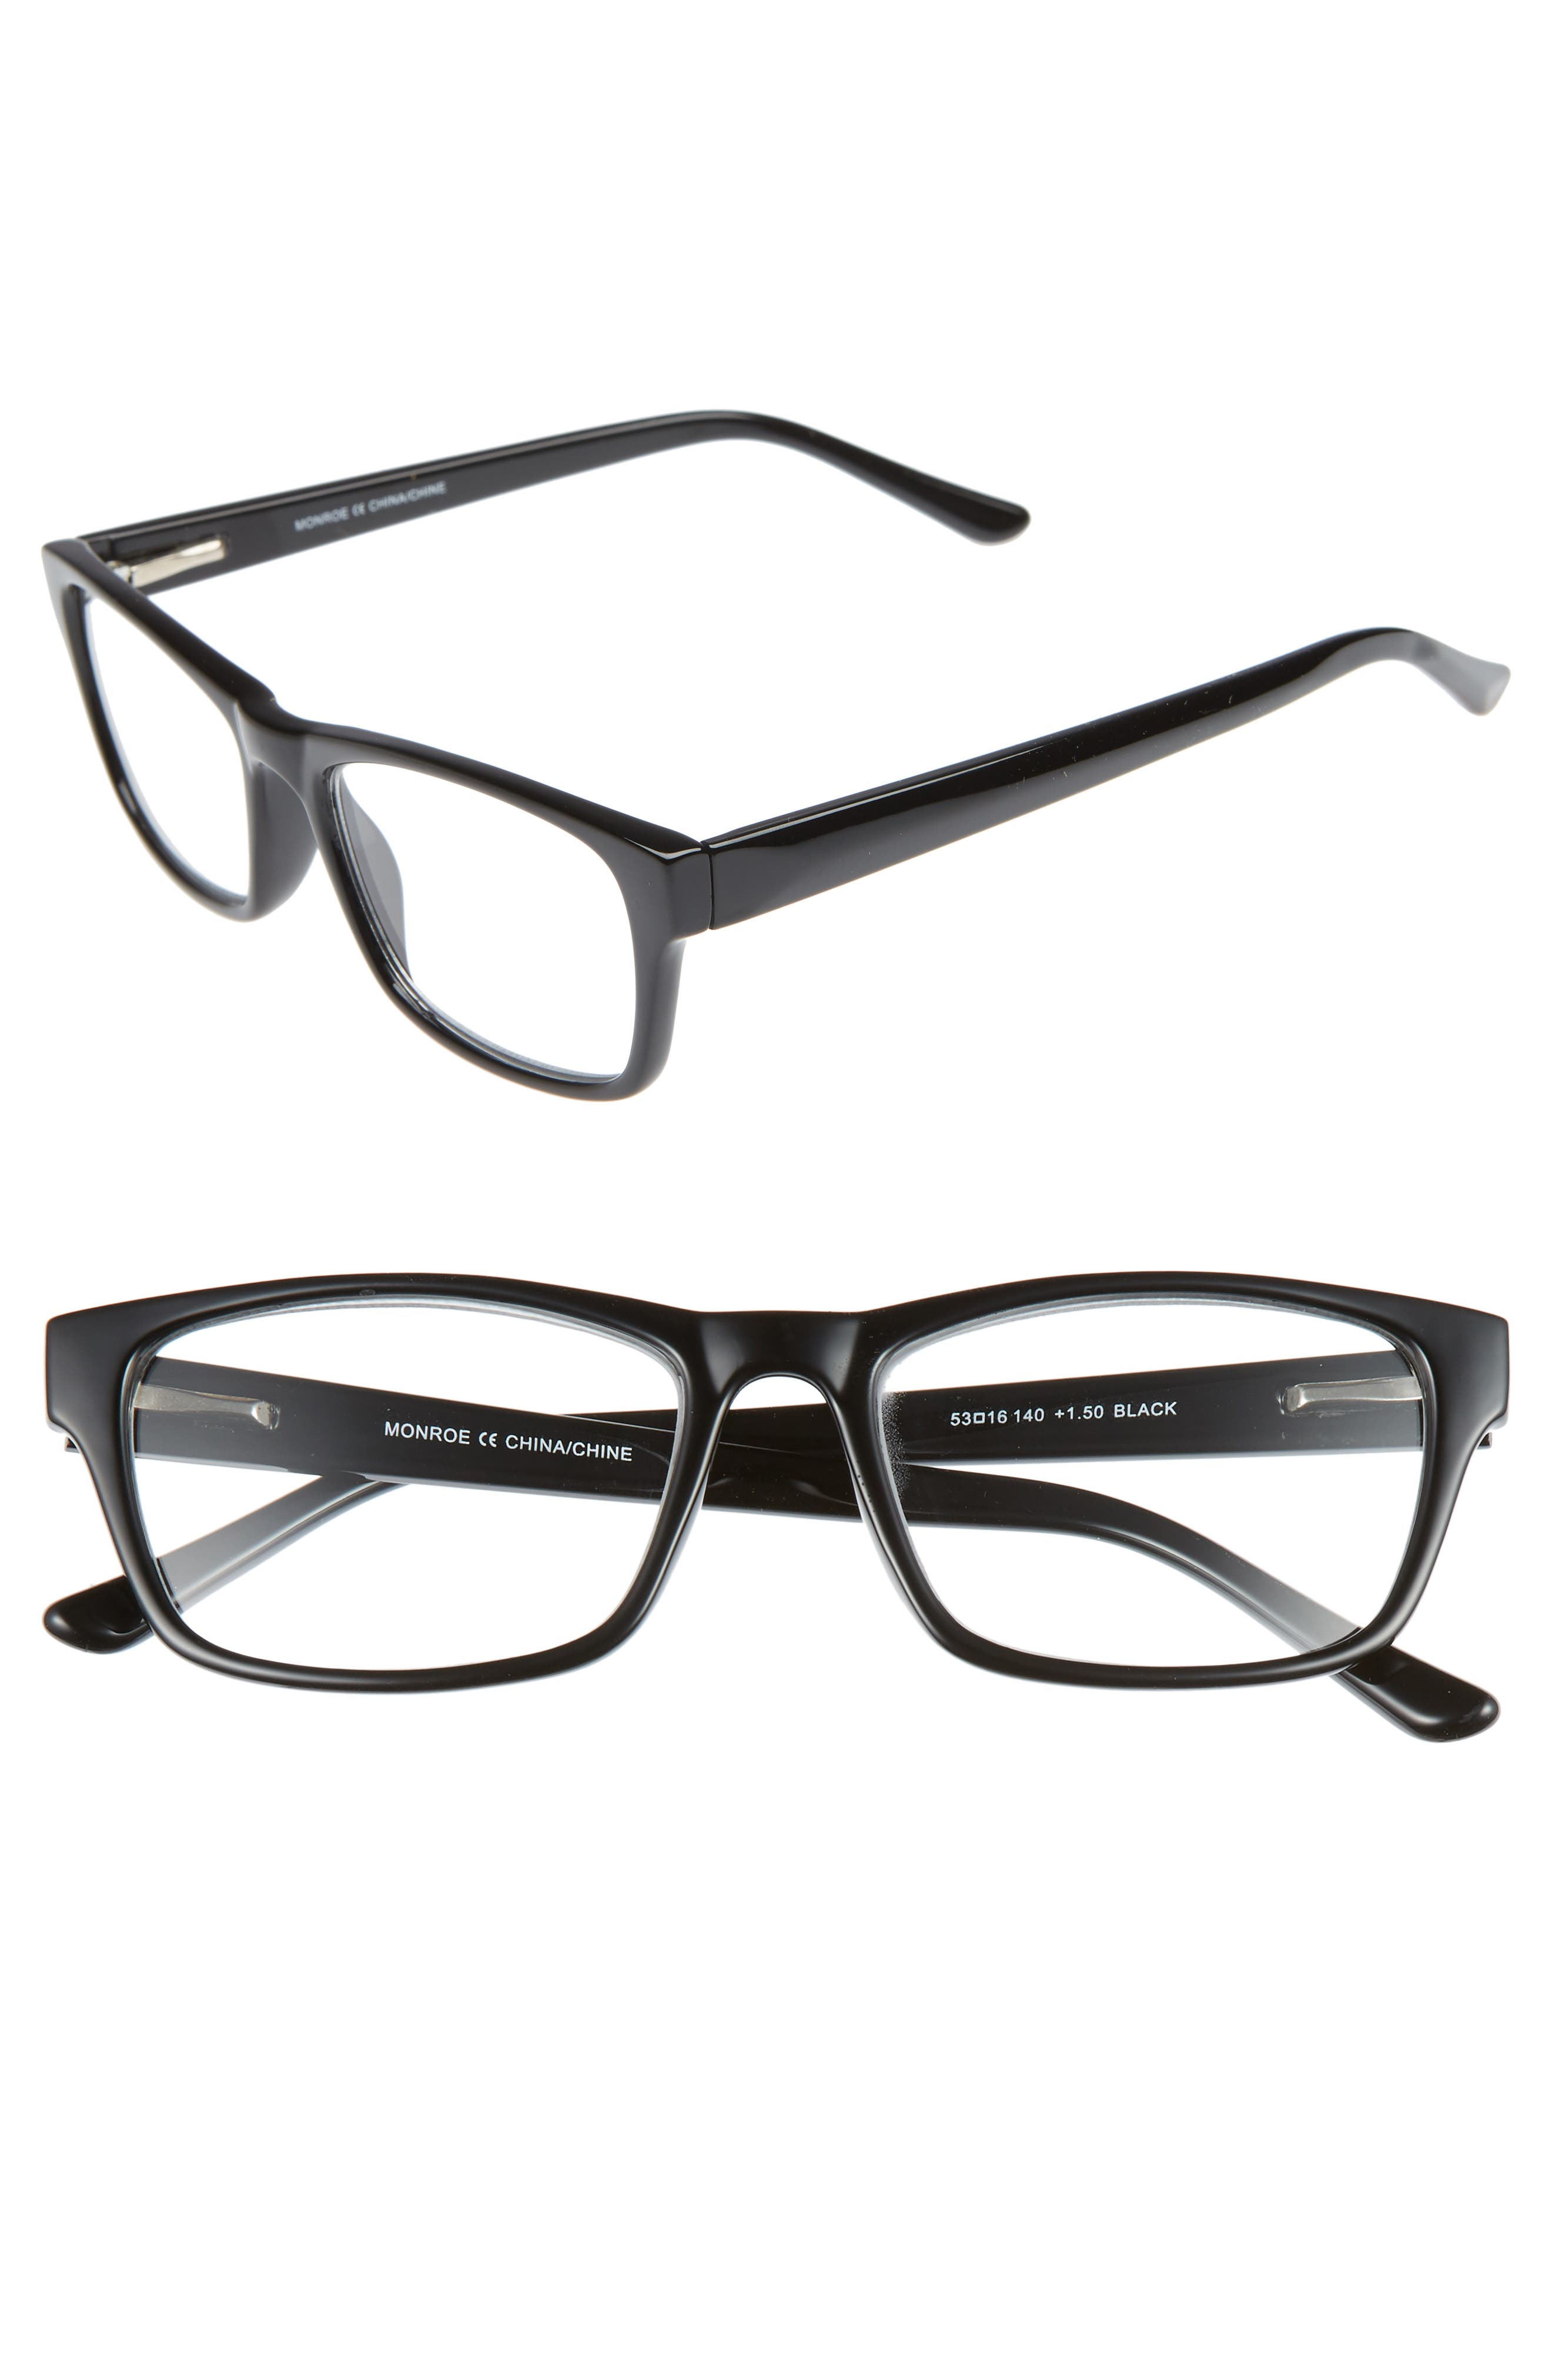 Monroe 53mm Reading Glasses,                         Main,                         color, BLACK